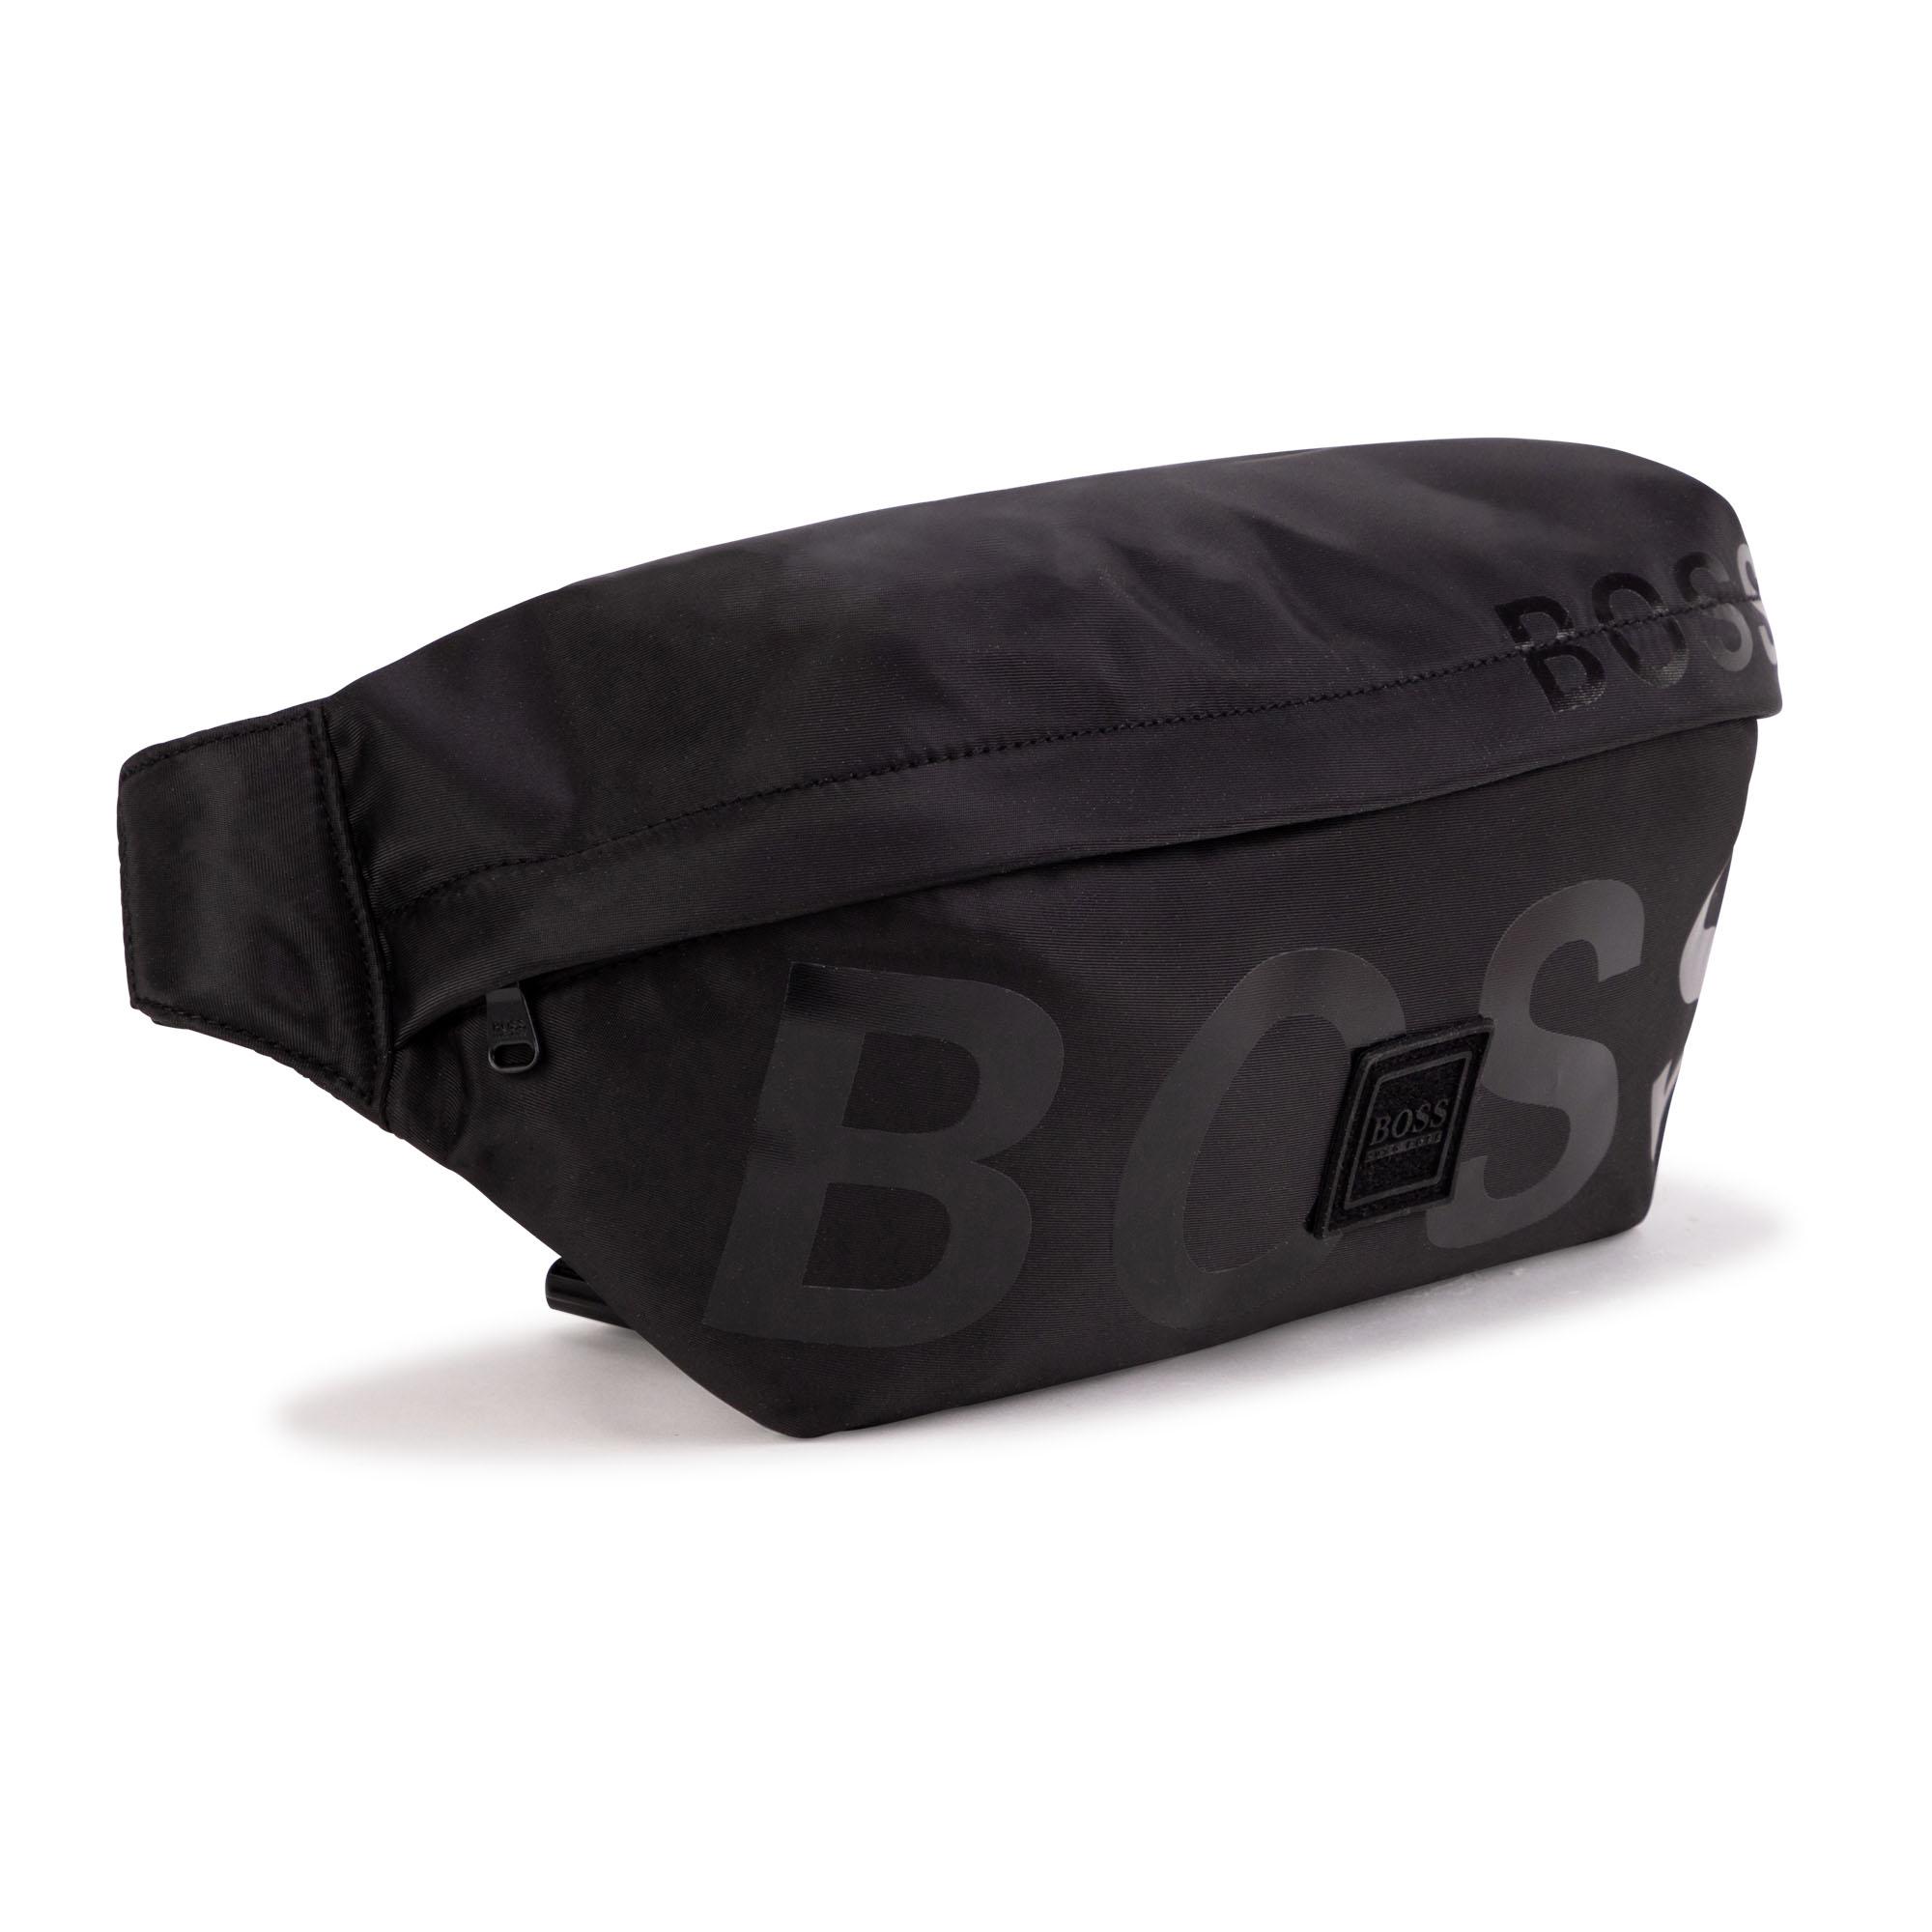 Adjustable bumbag BOSS for BOY